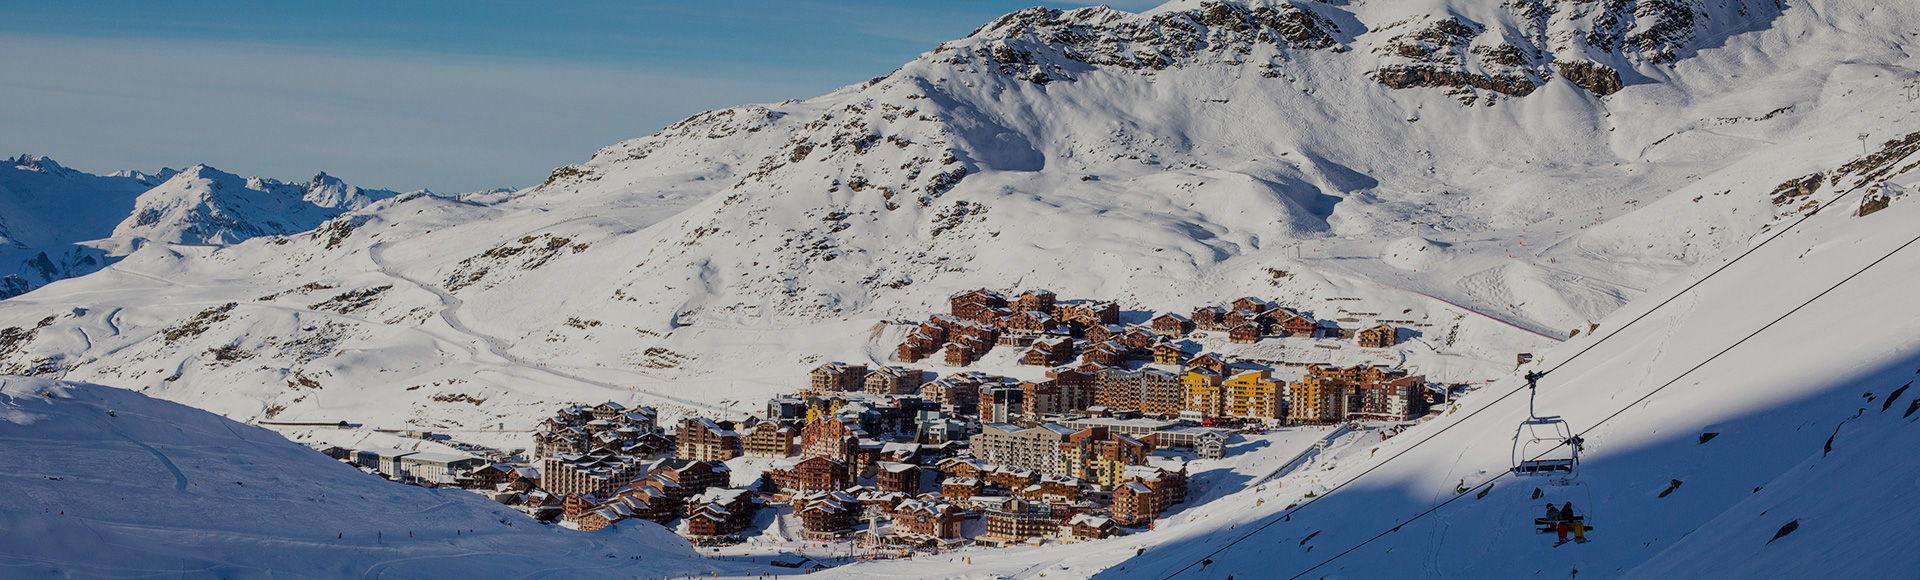 Skidresor Till Alperna - Frankrike  Italien  U0026  U00d6sterrike